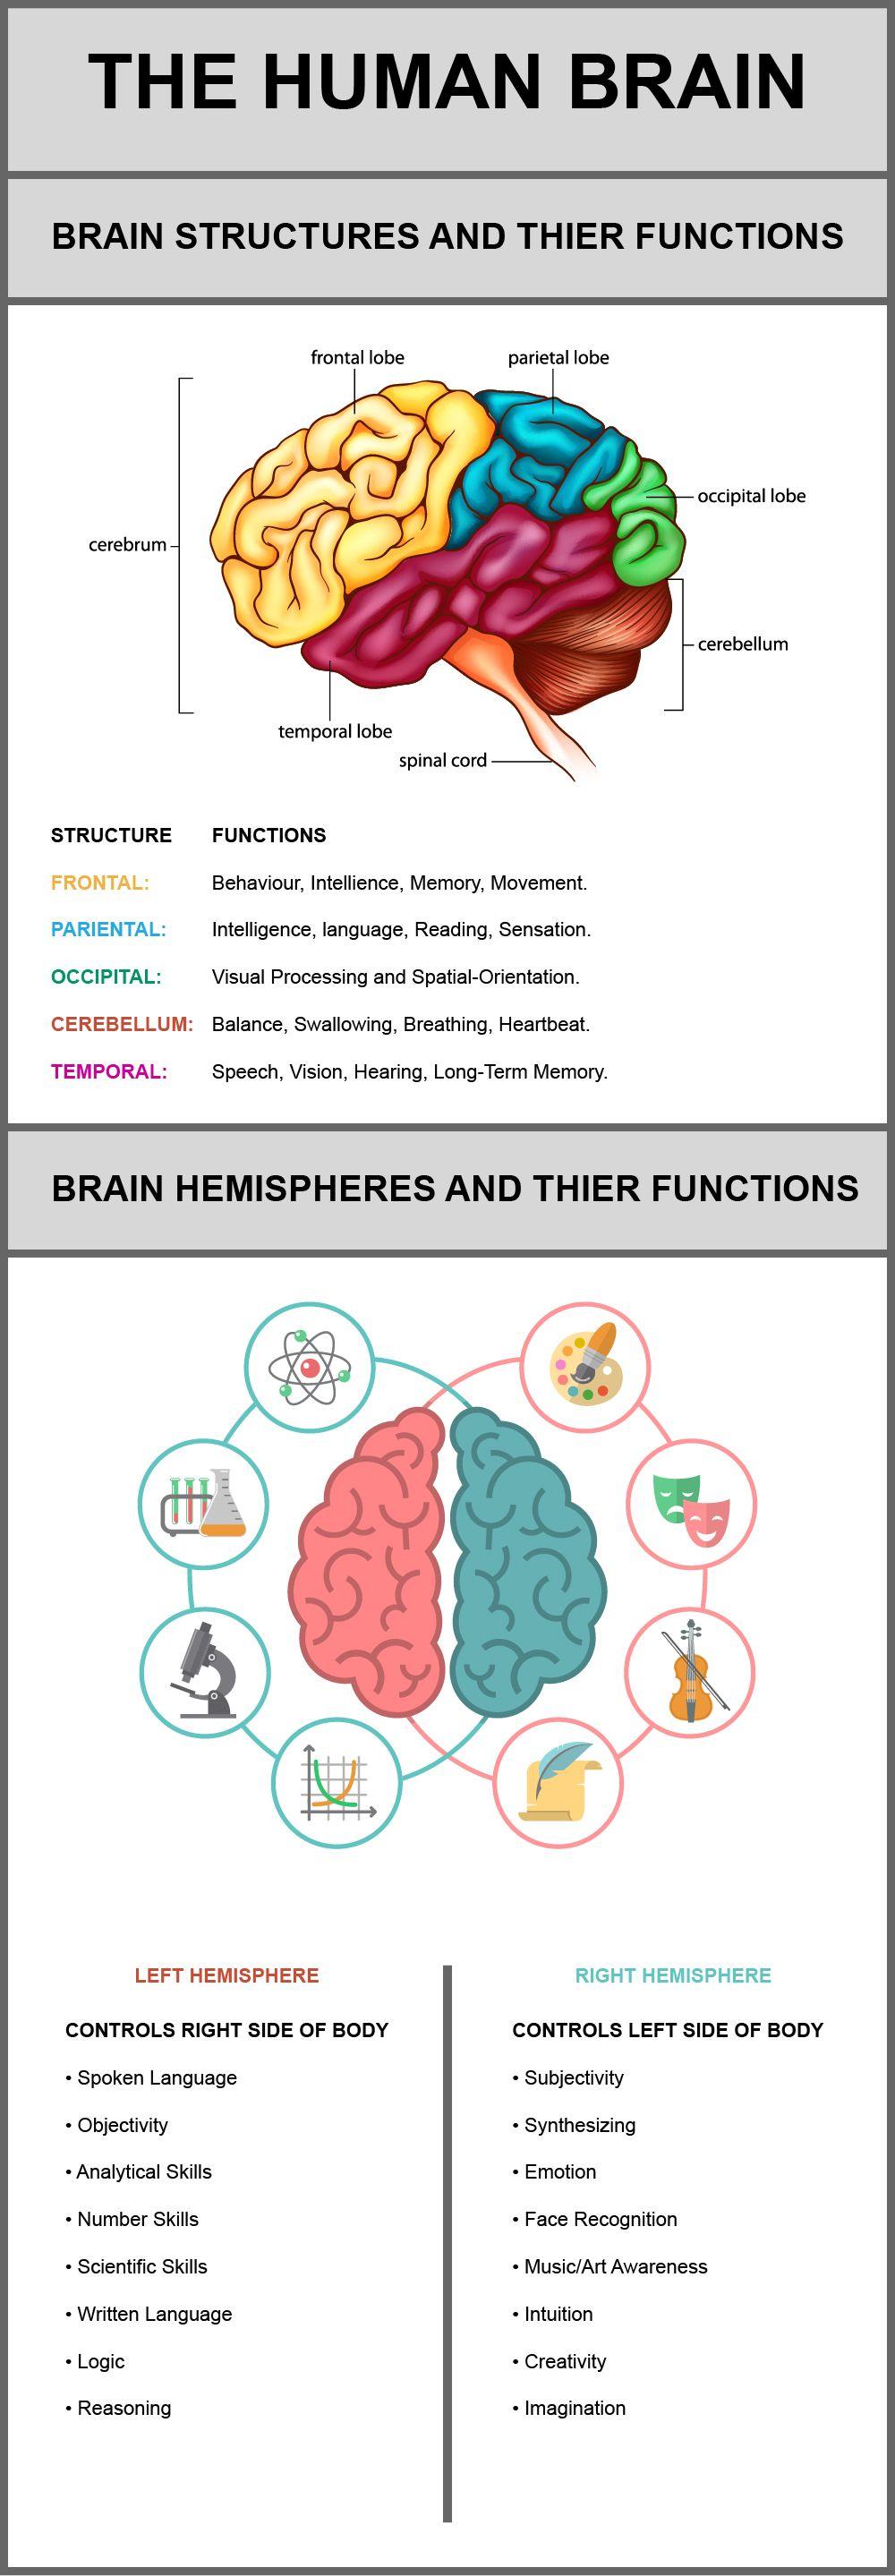 17+ The Hemispheres Of The Brain Left Vs. Right